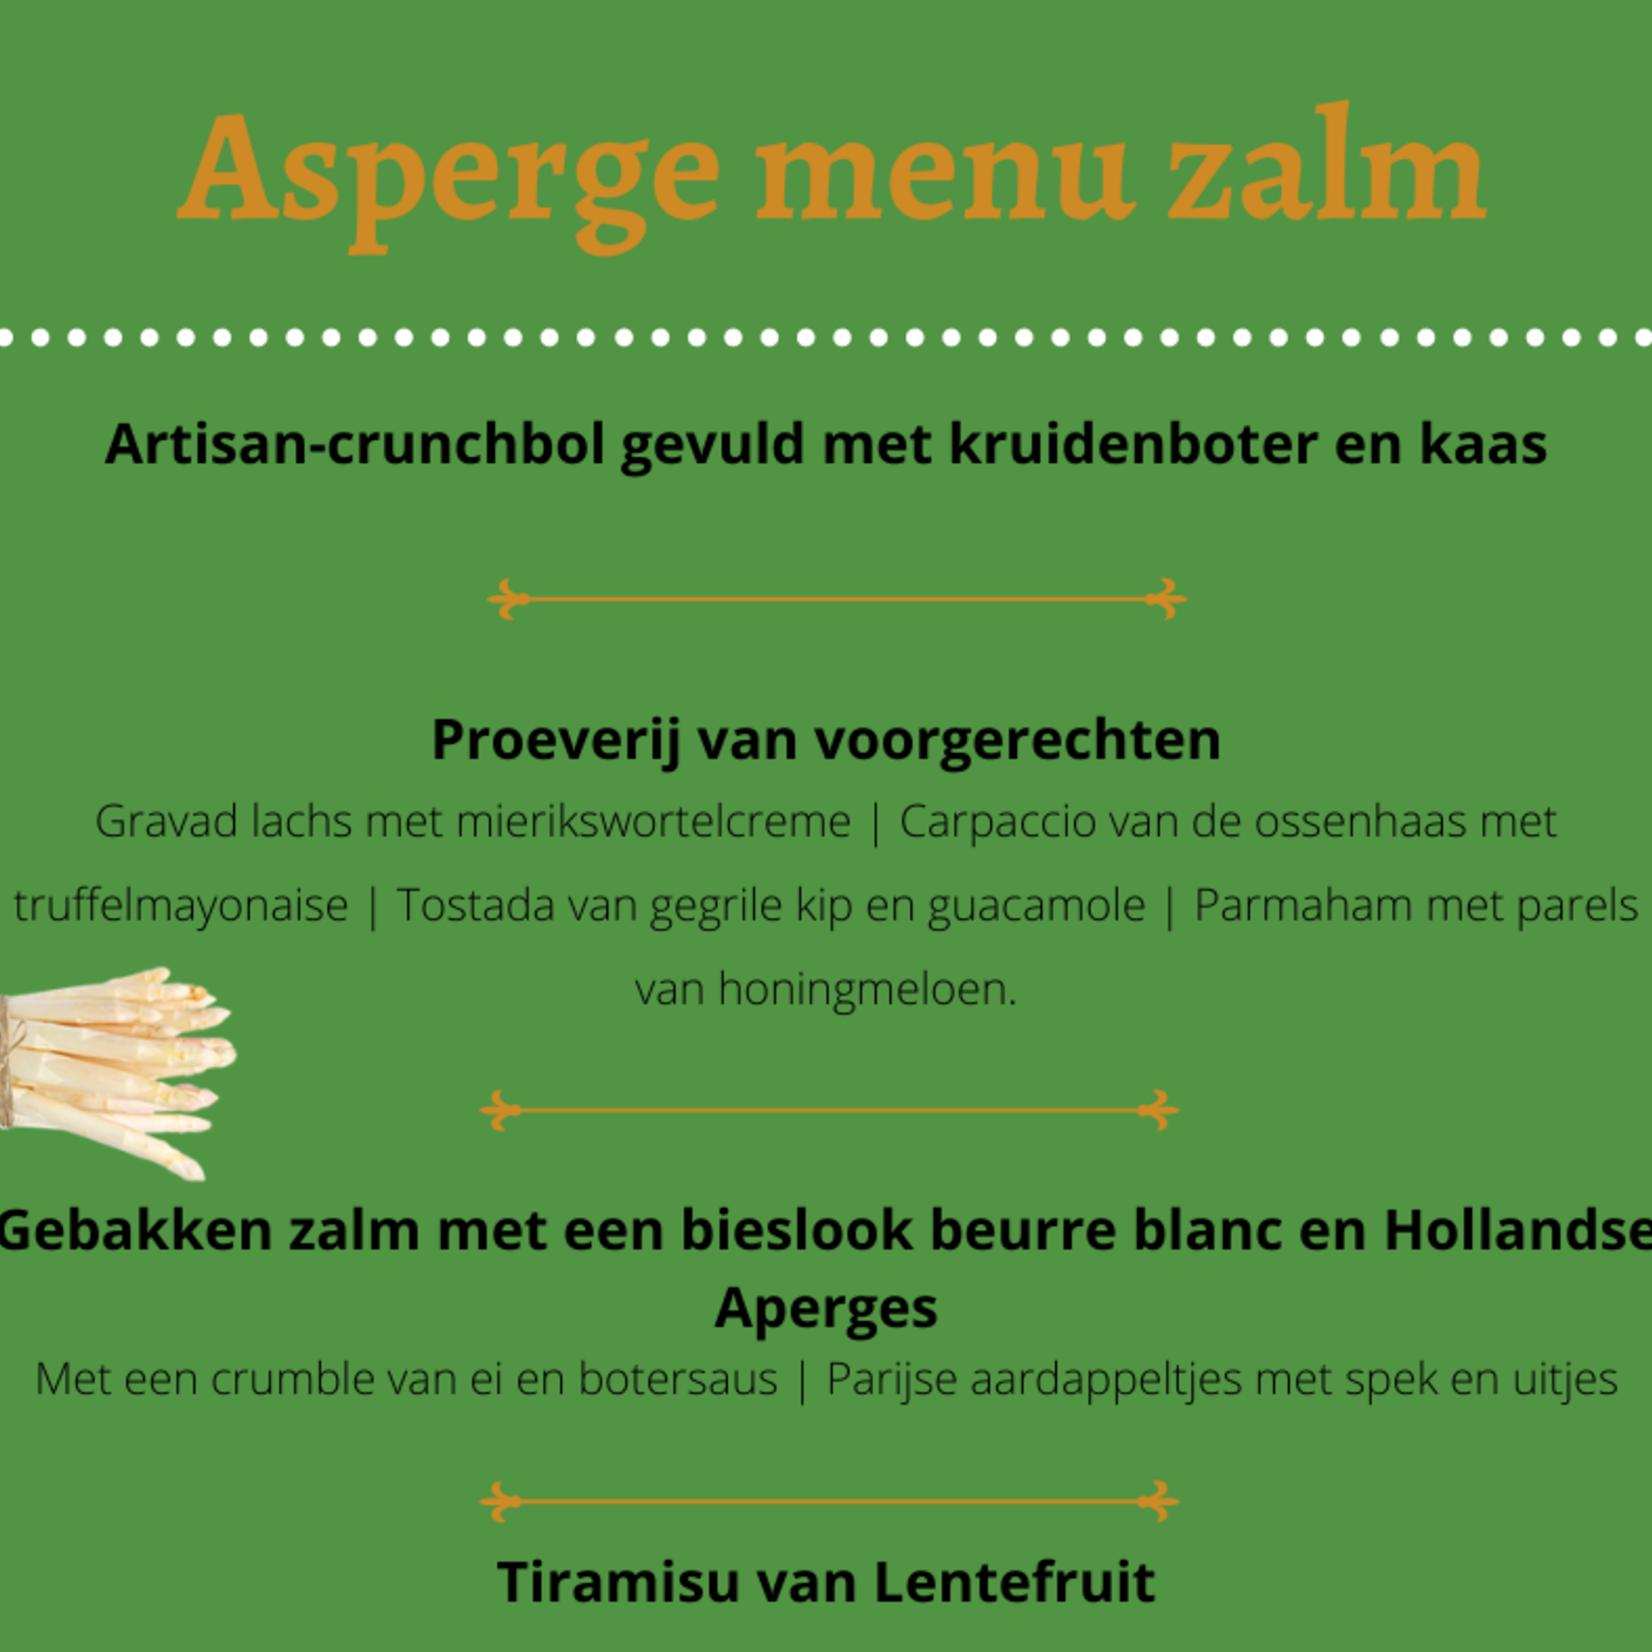 Asperge menu Vis | per persoon | Berentsen